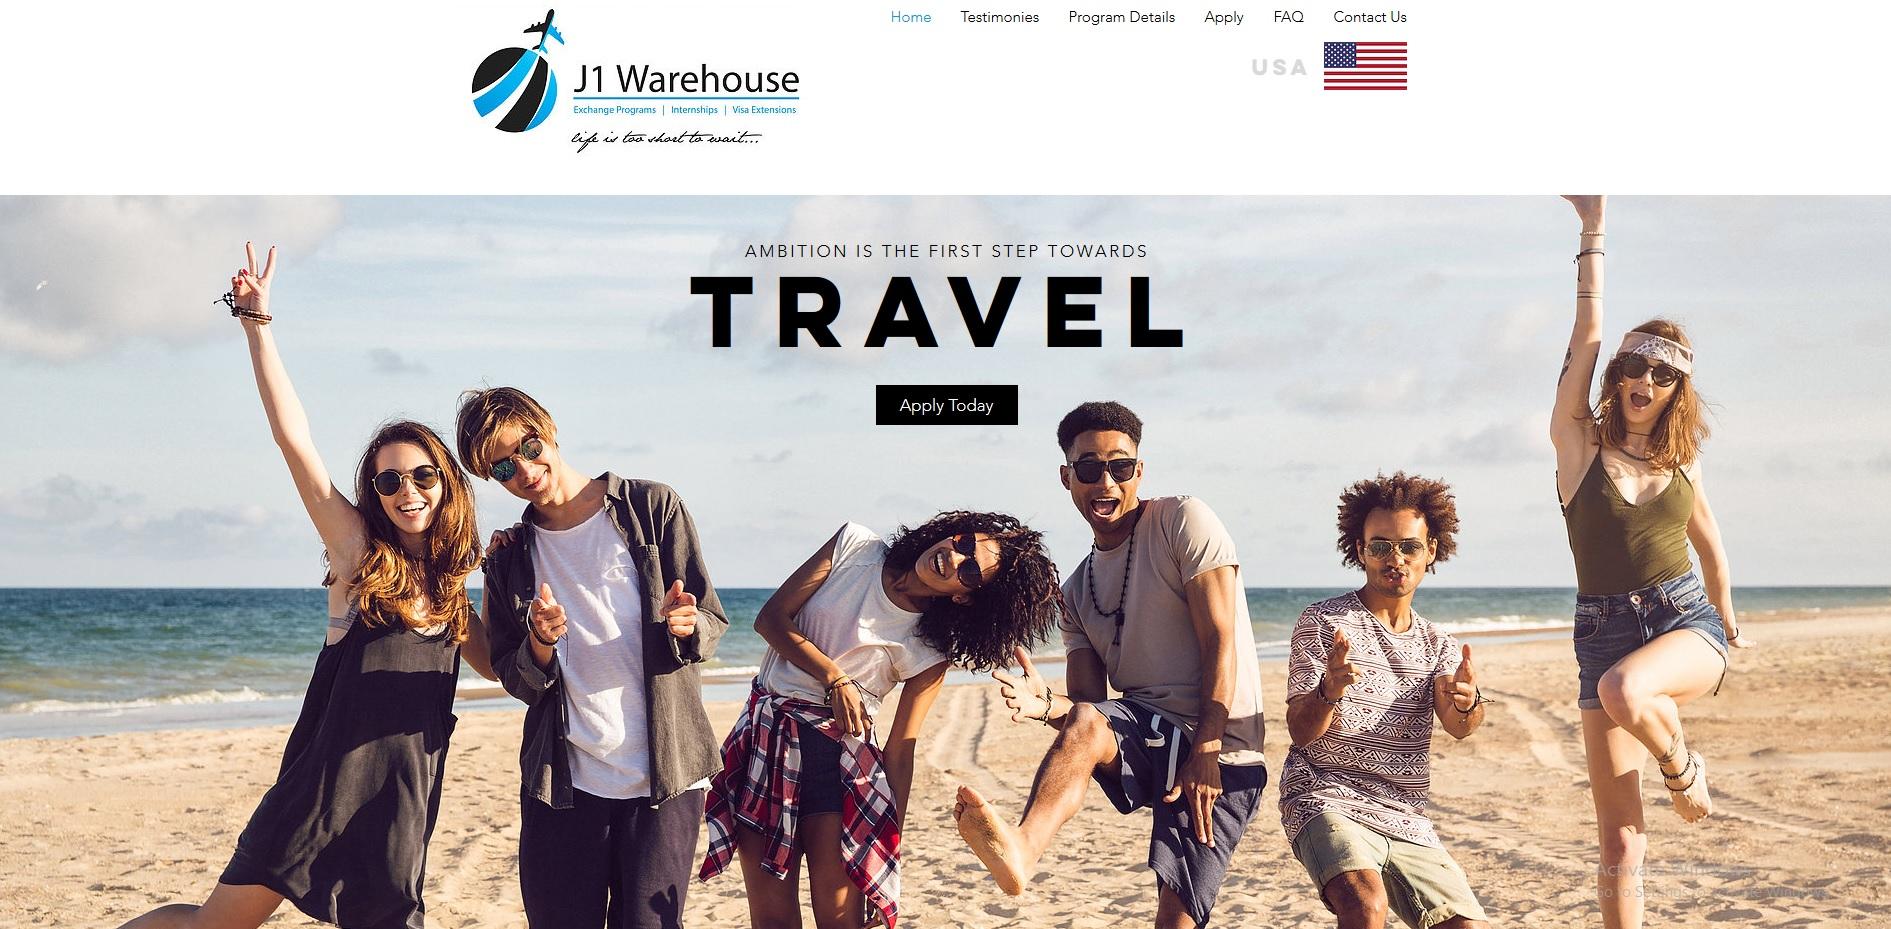 J1 Warehouse